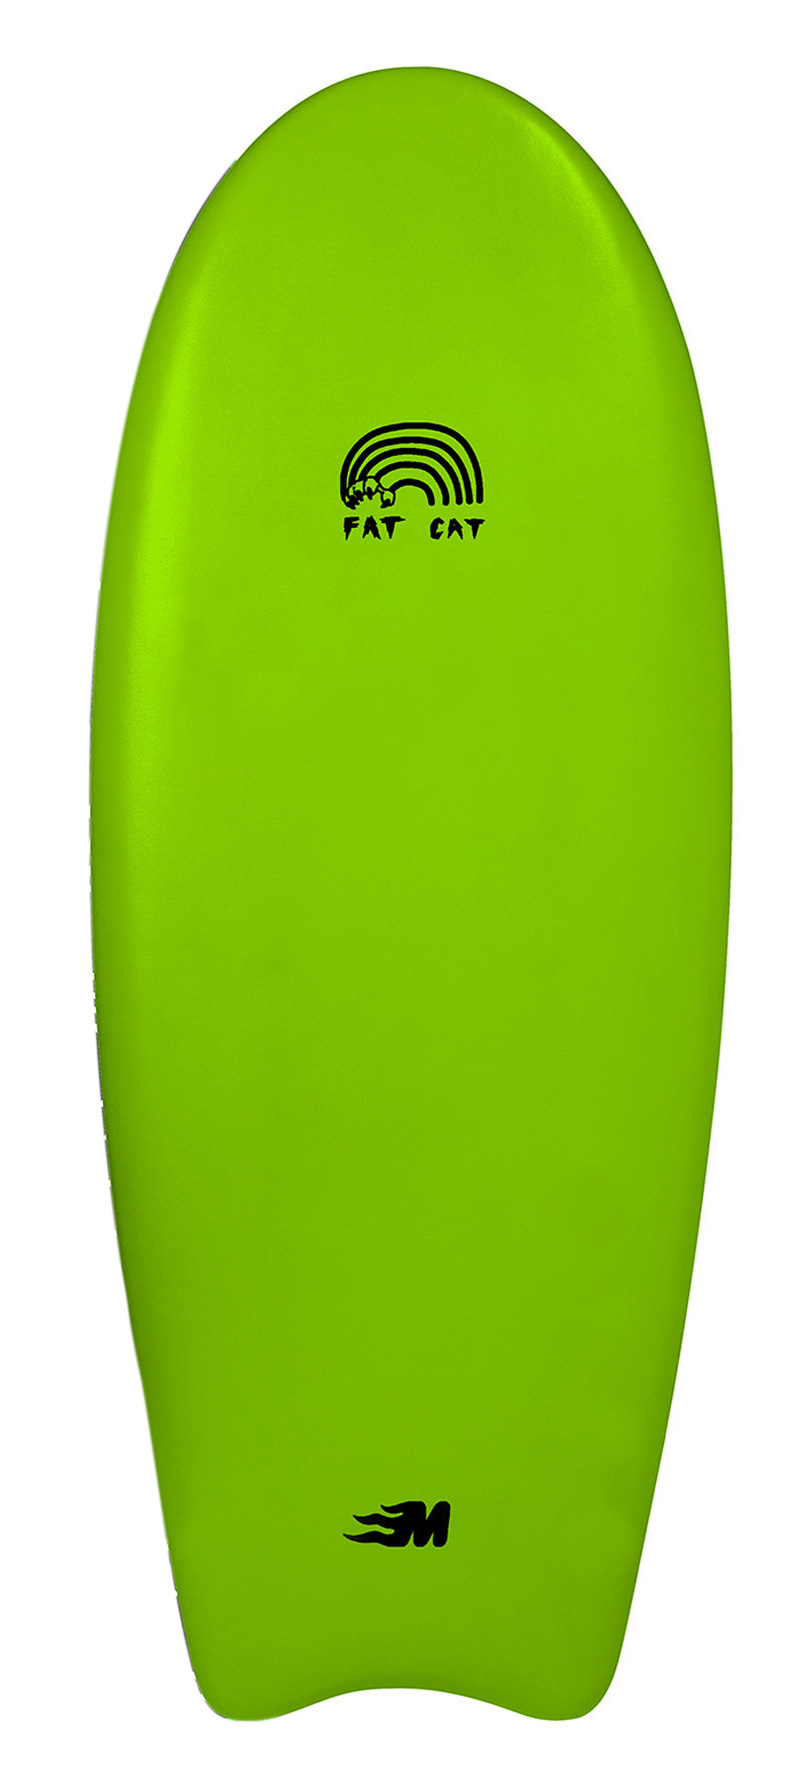 "Mullet 4'8"" Fat Cat Green"